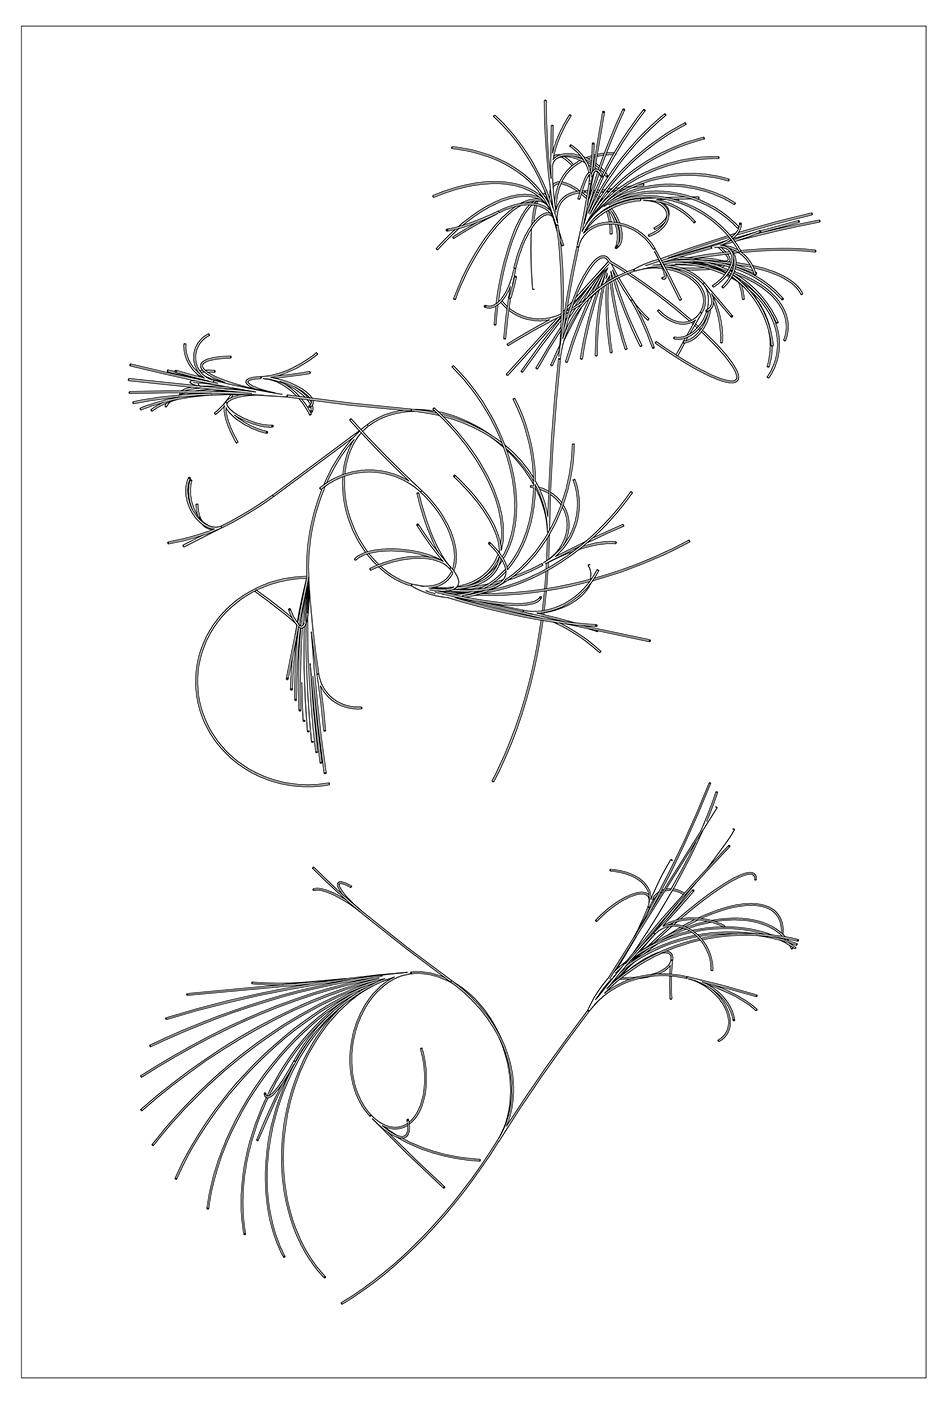 Digital Sketchbook 02a - Space and Paper